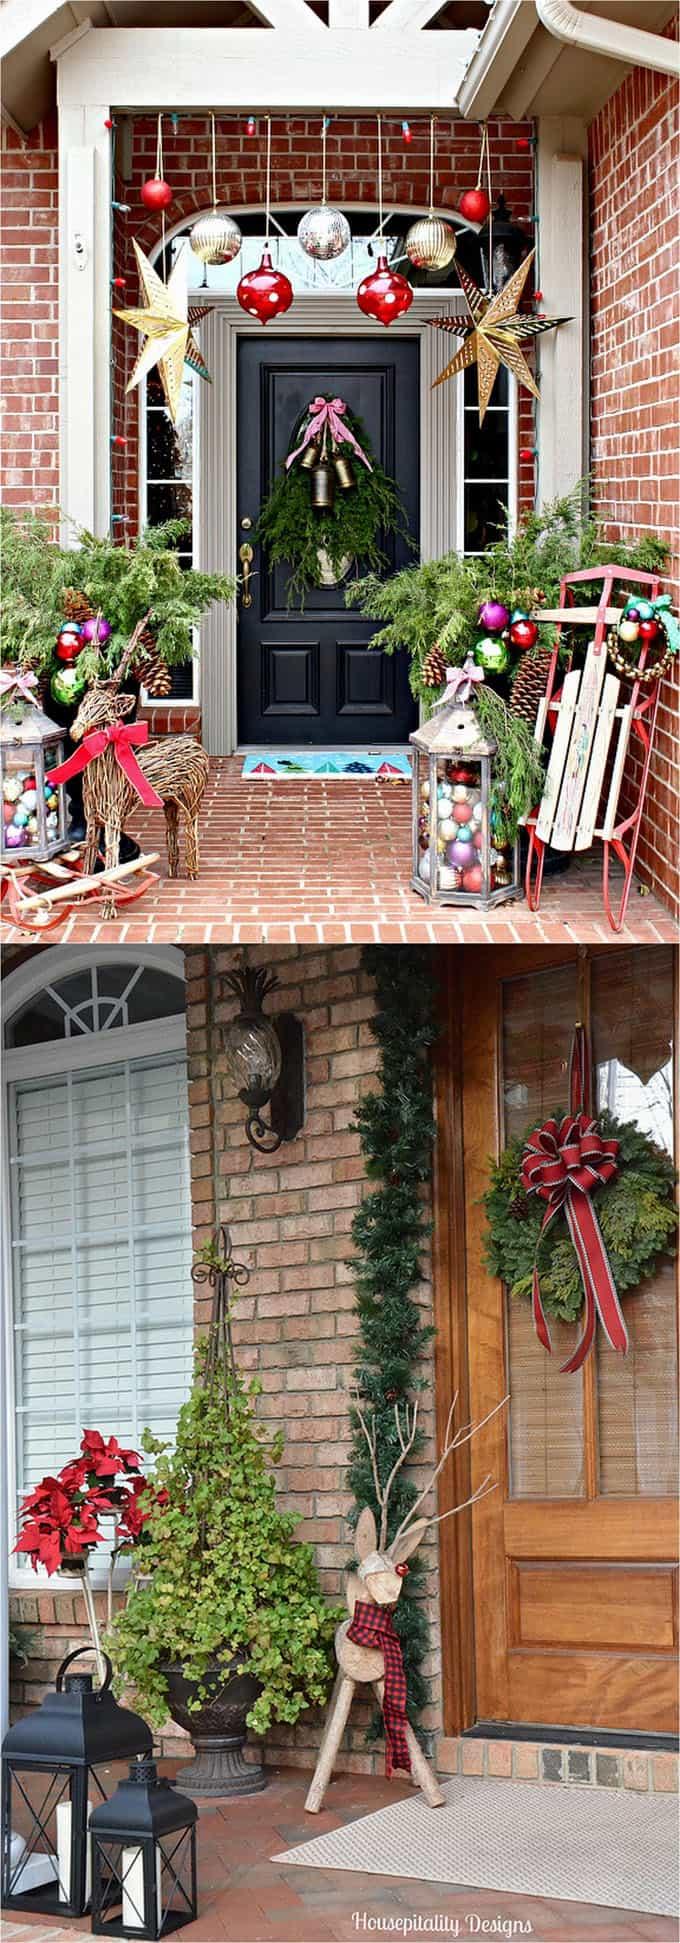 Decoracion Exterior Navidad Novocom Top